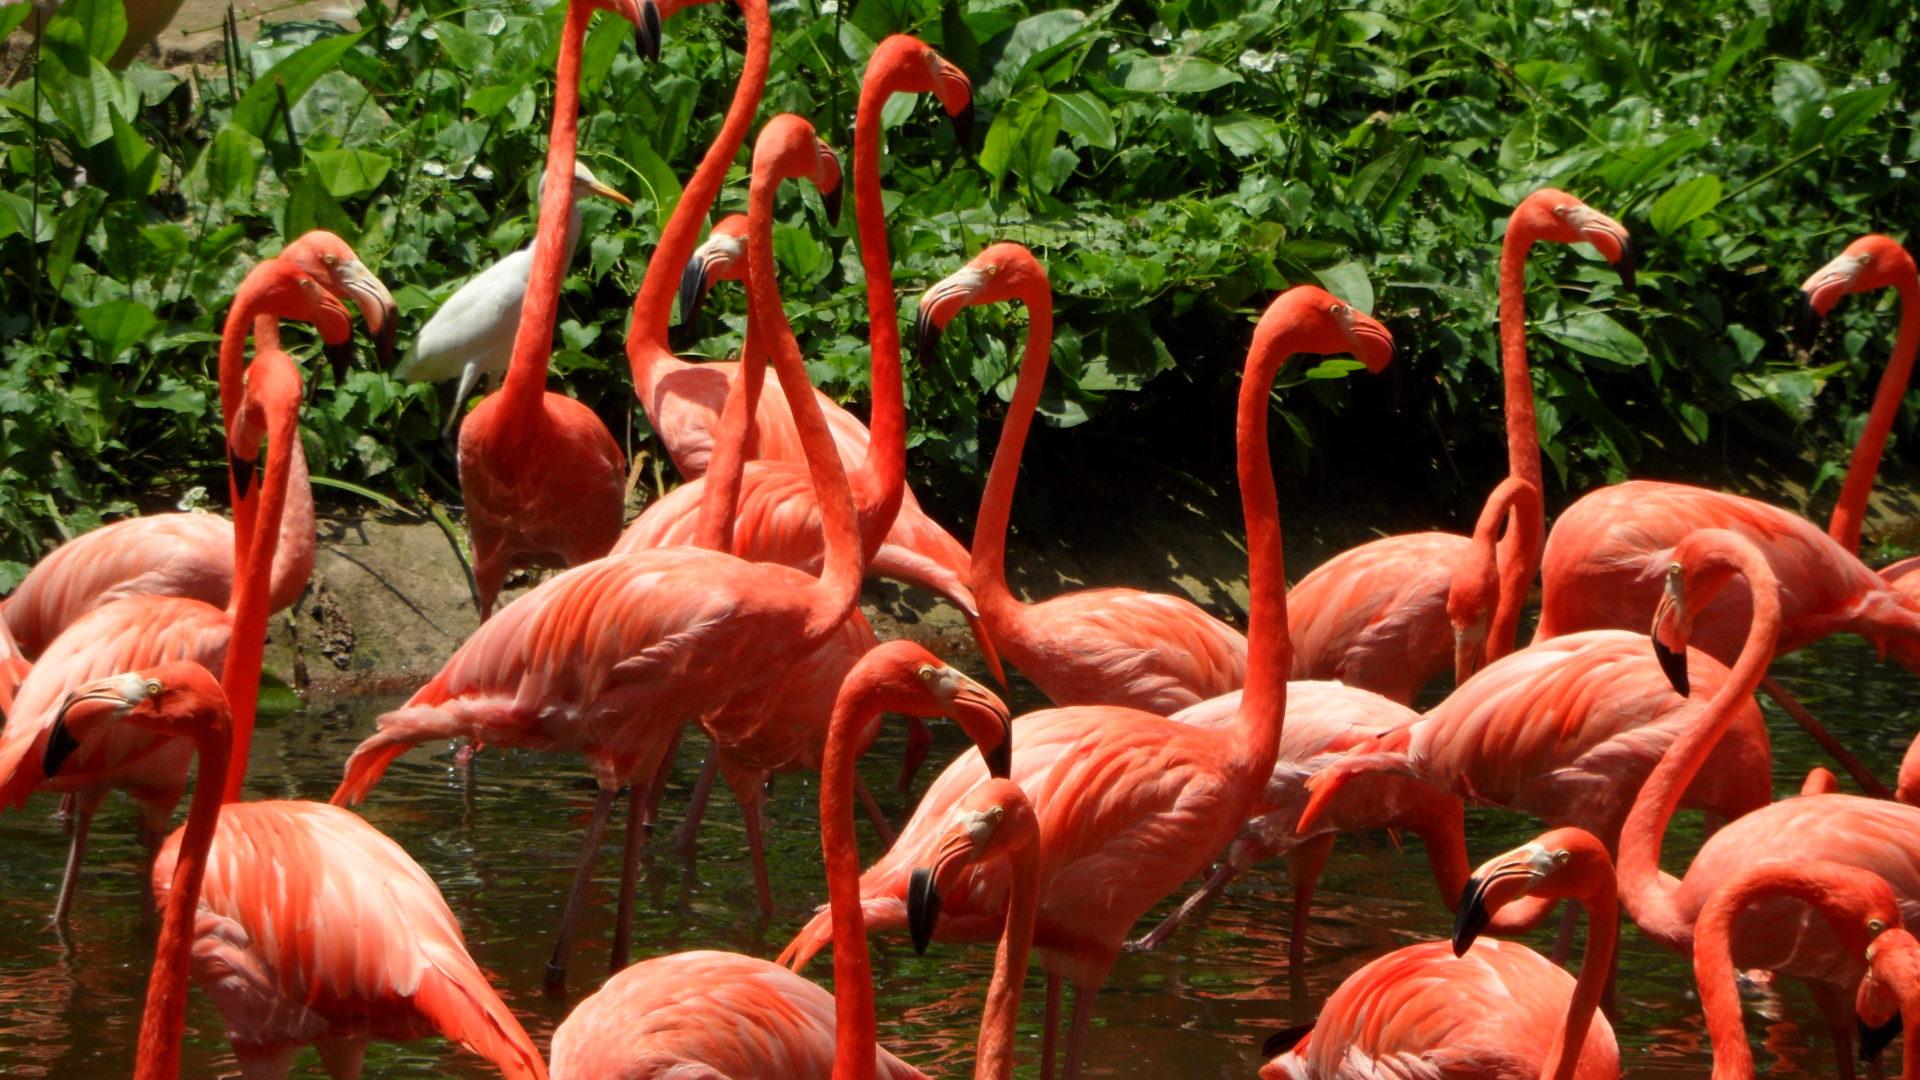 Flamingo Iphone Wallpaper Flamingos Birds Singapore Jurong Park Desktop Wallpaper